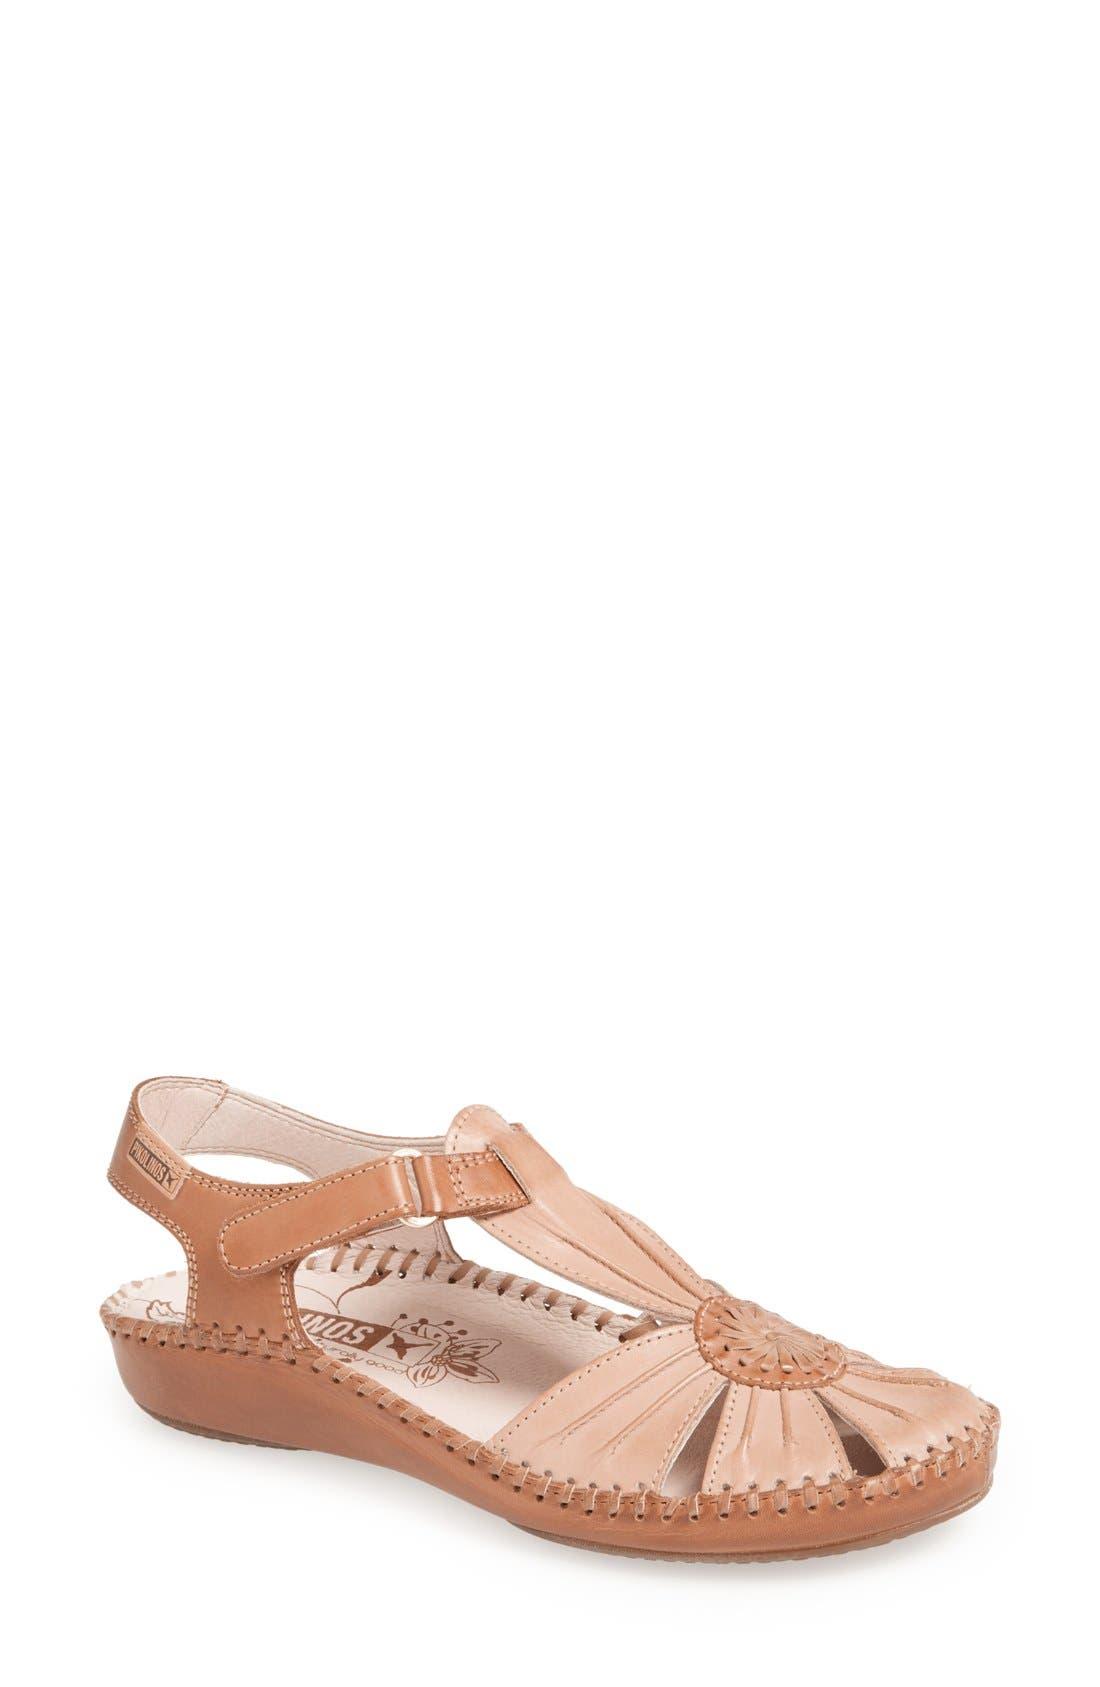 Alternate Image 1 Selected - PIKOLINOS 'Vallarta' Sandal